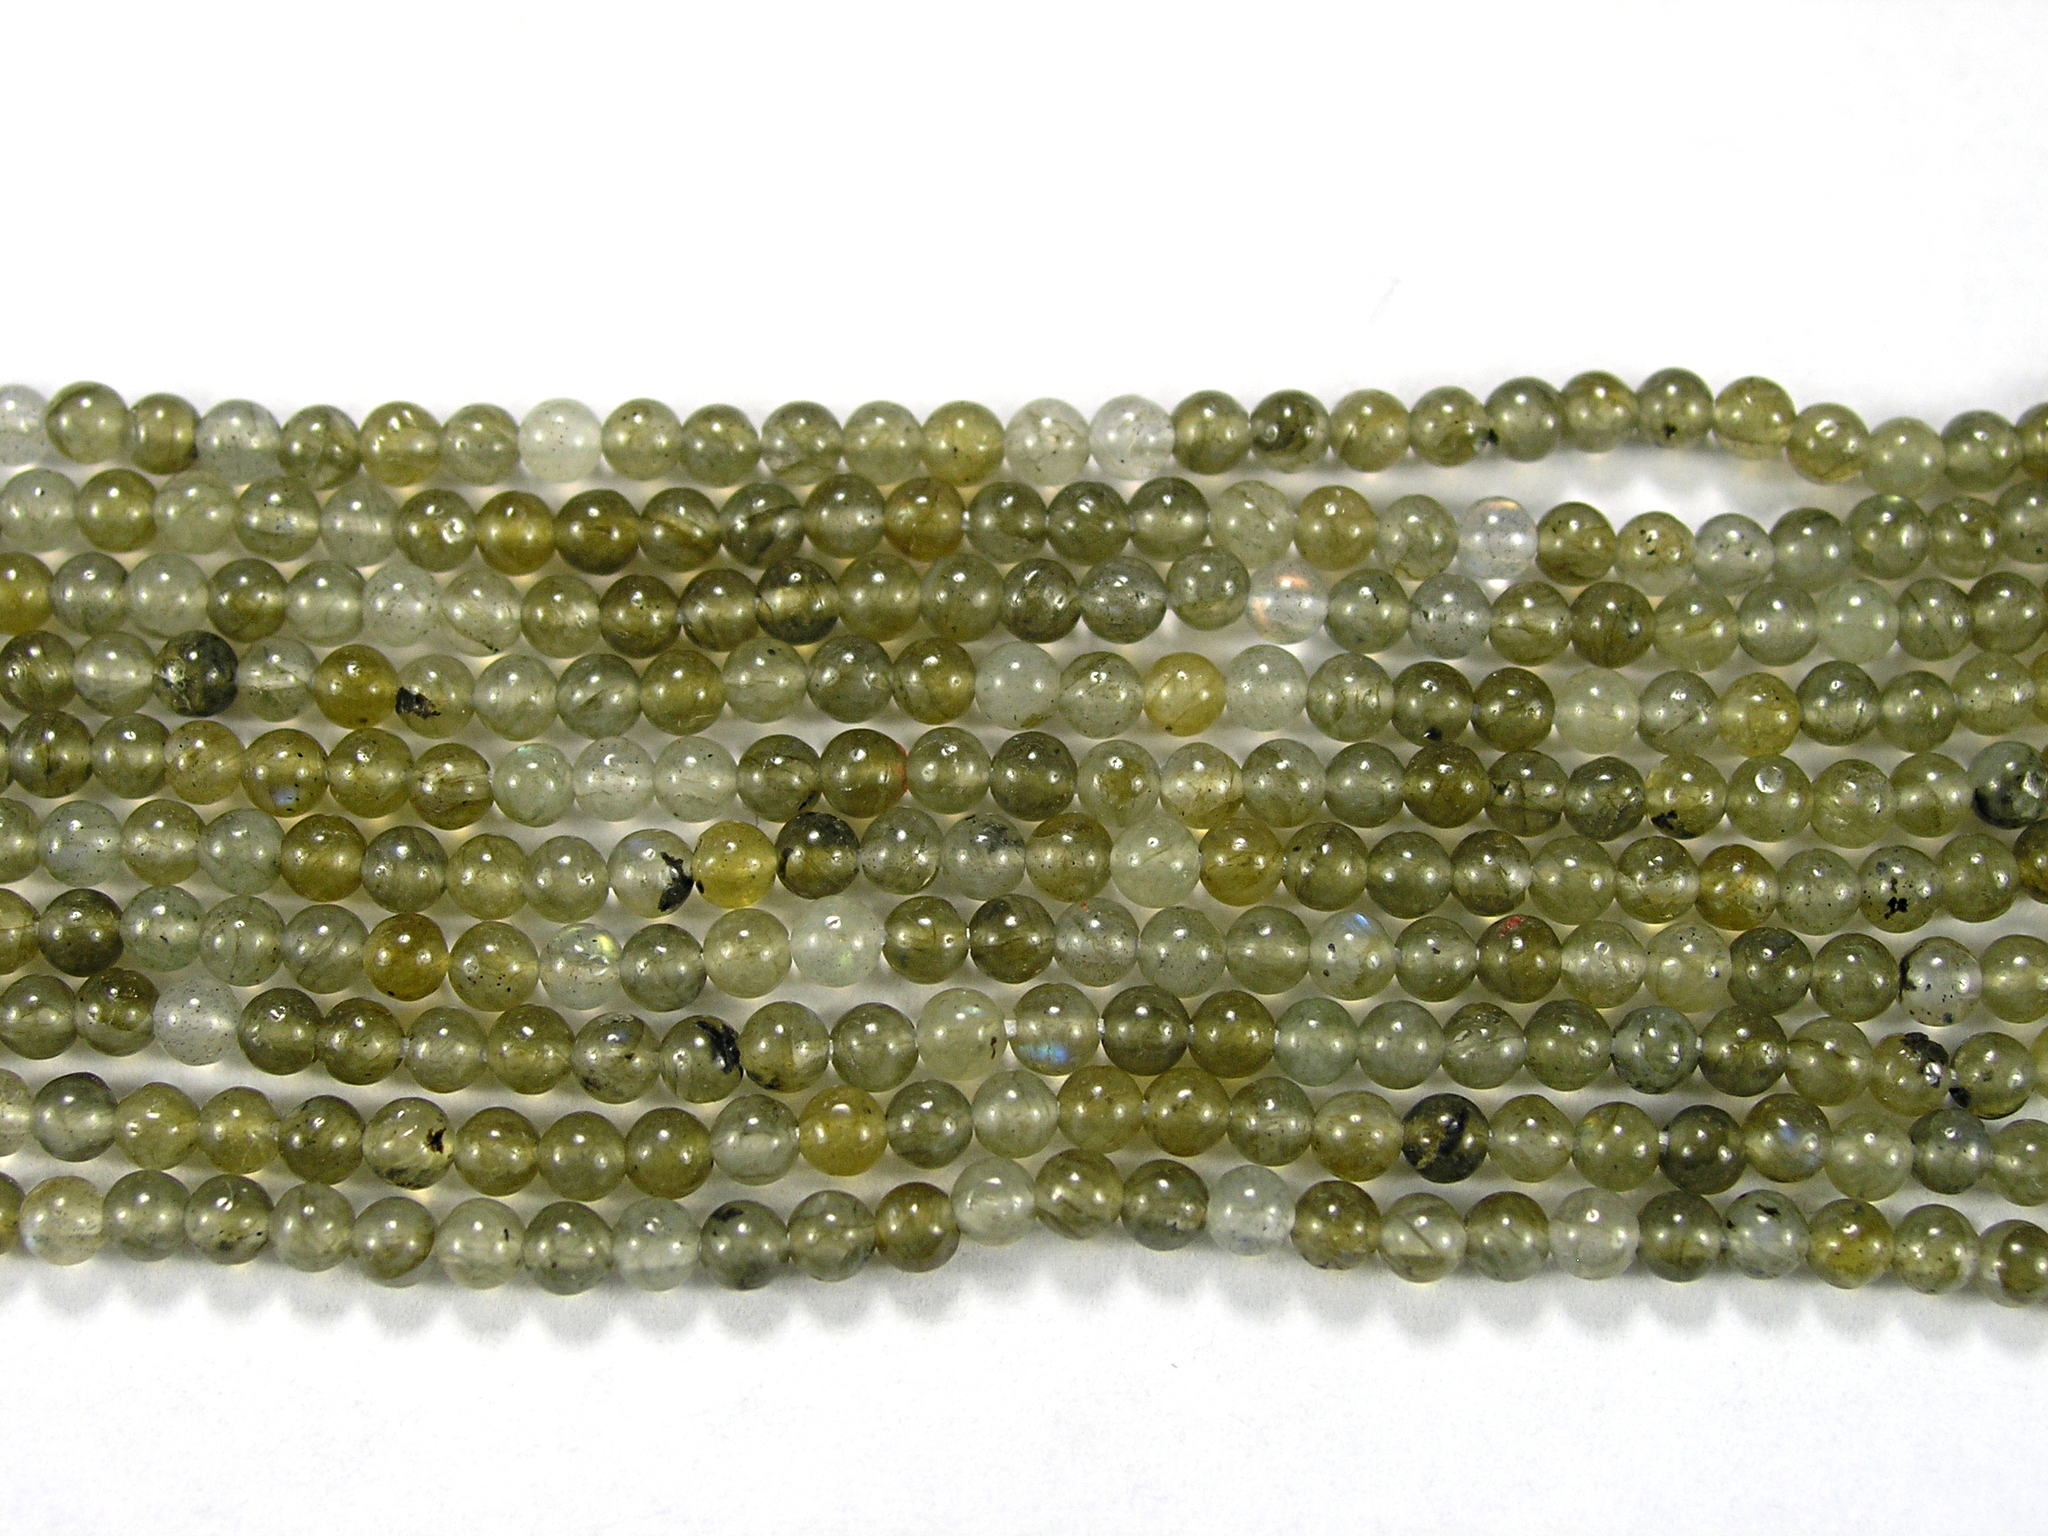 Нить Бисера из лабрадора (спектролита), шар гладкий 2мм